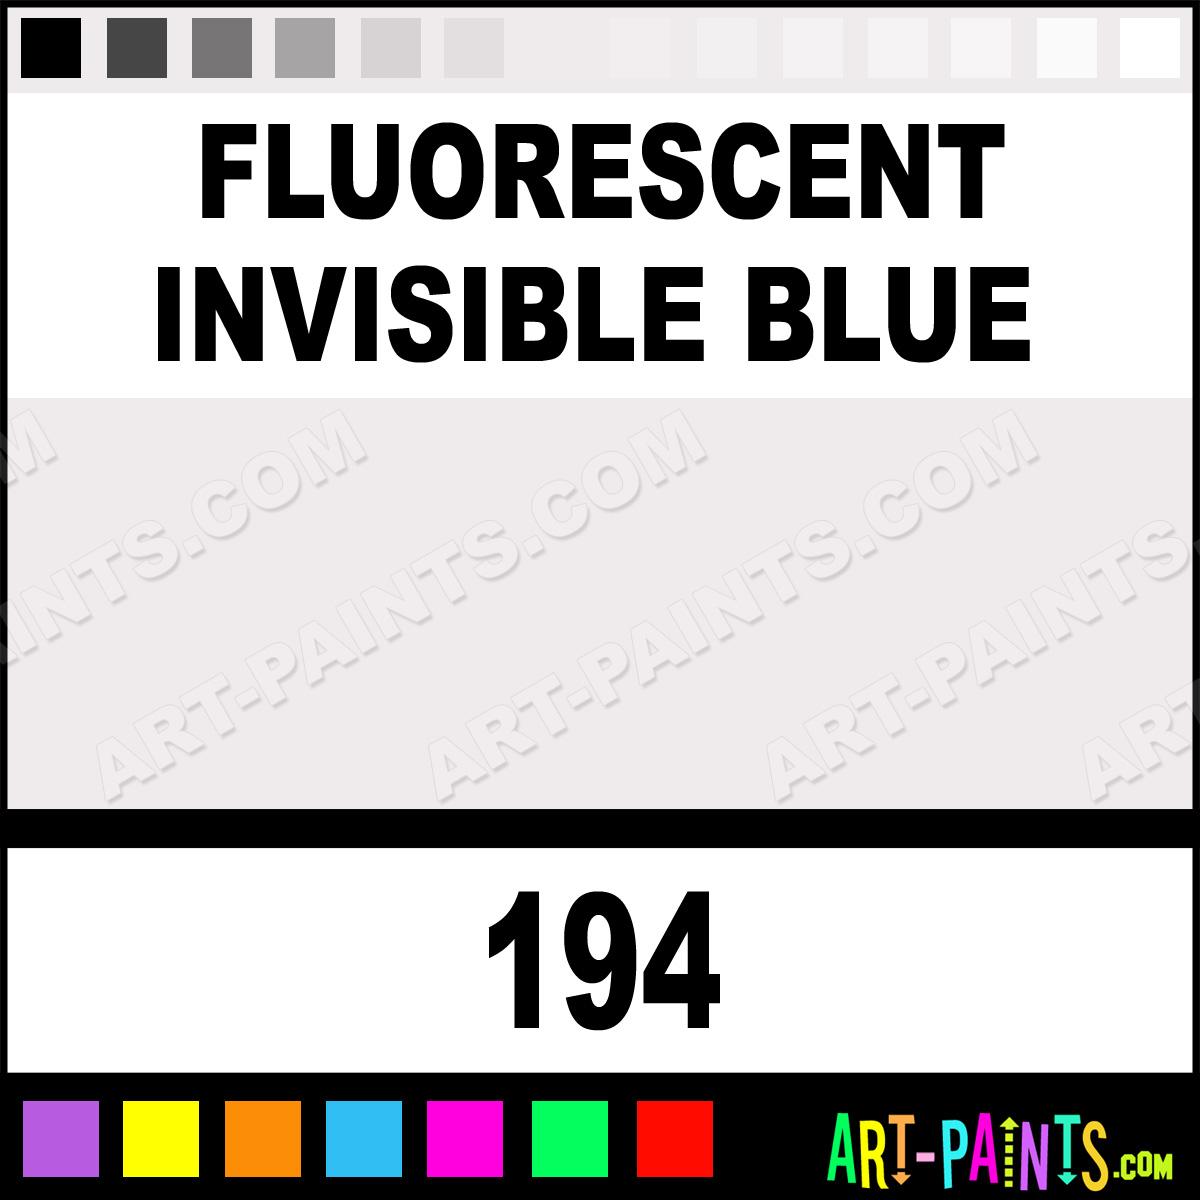 Invisible Blue Fluorescent Paint